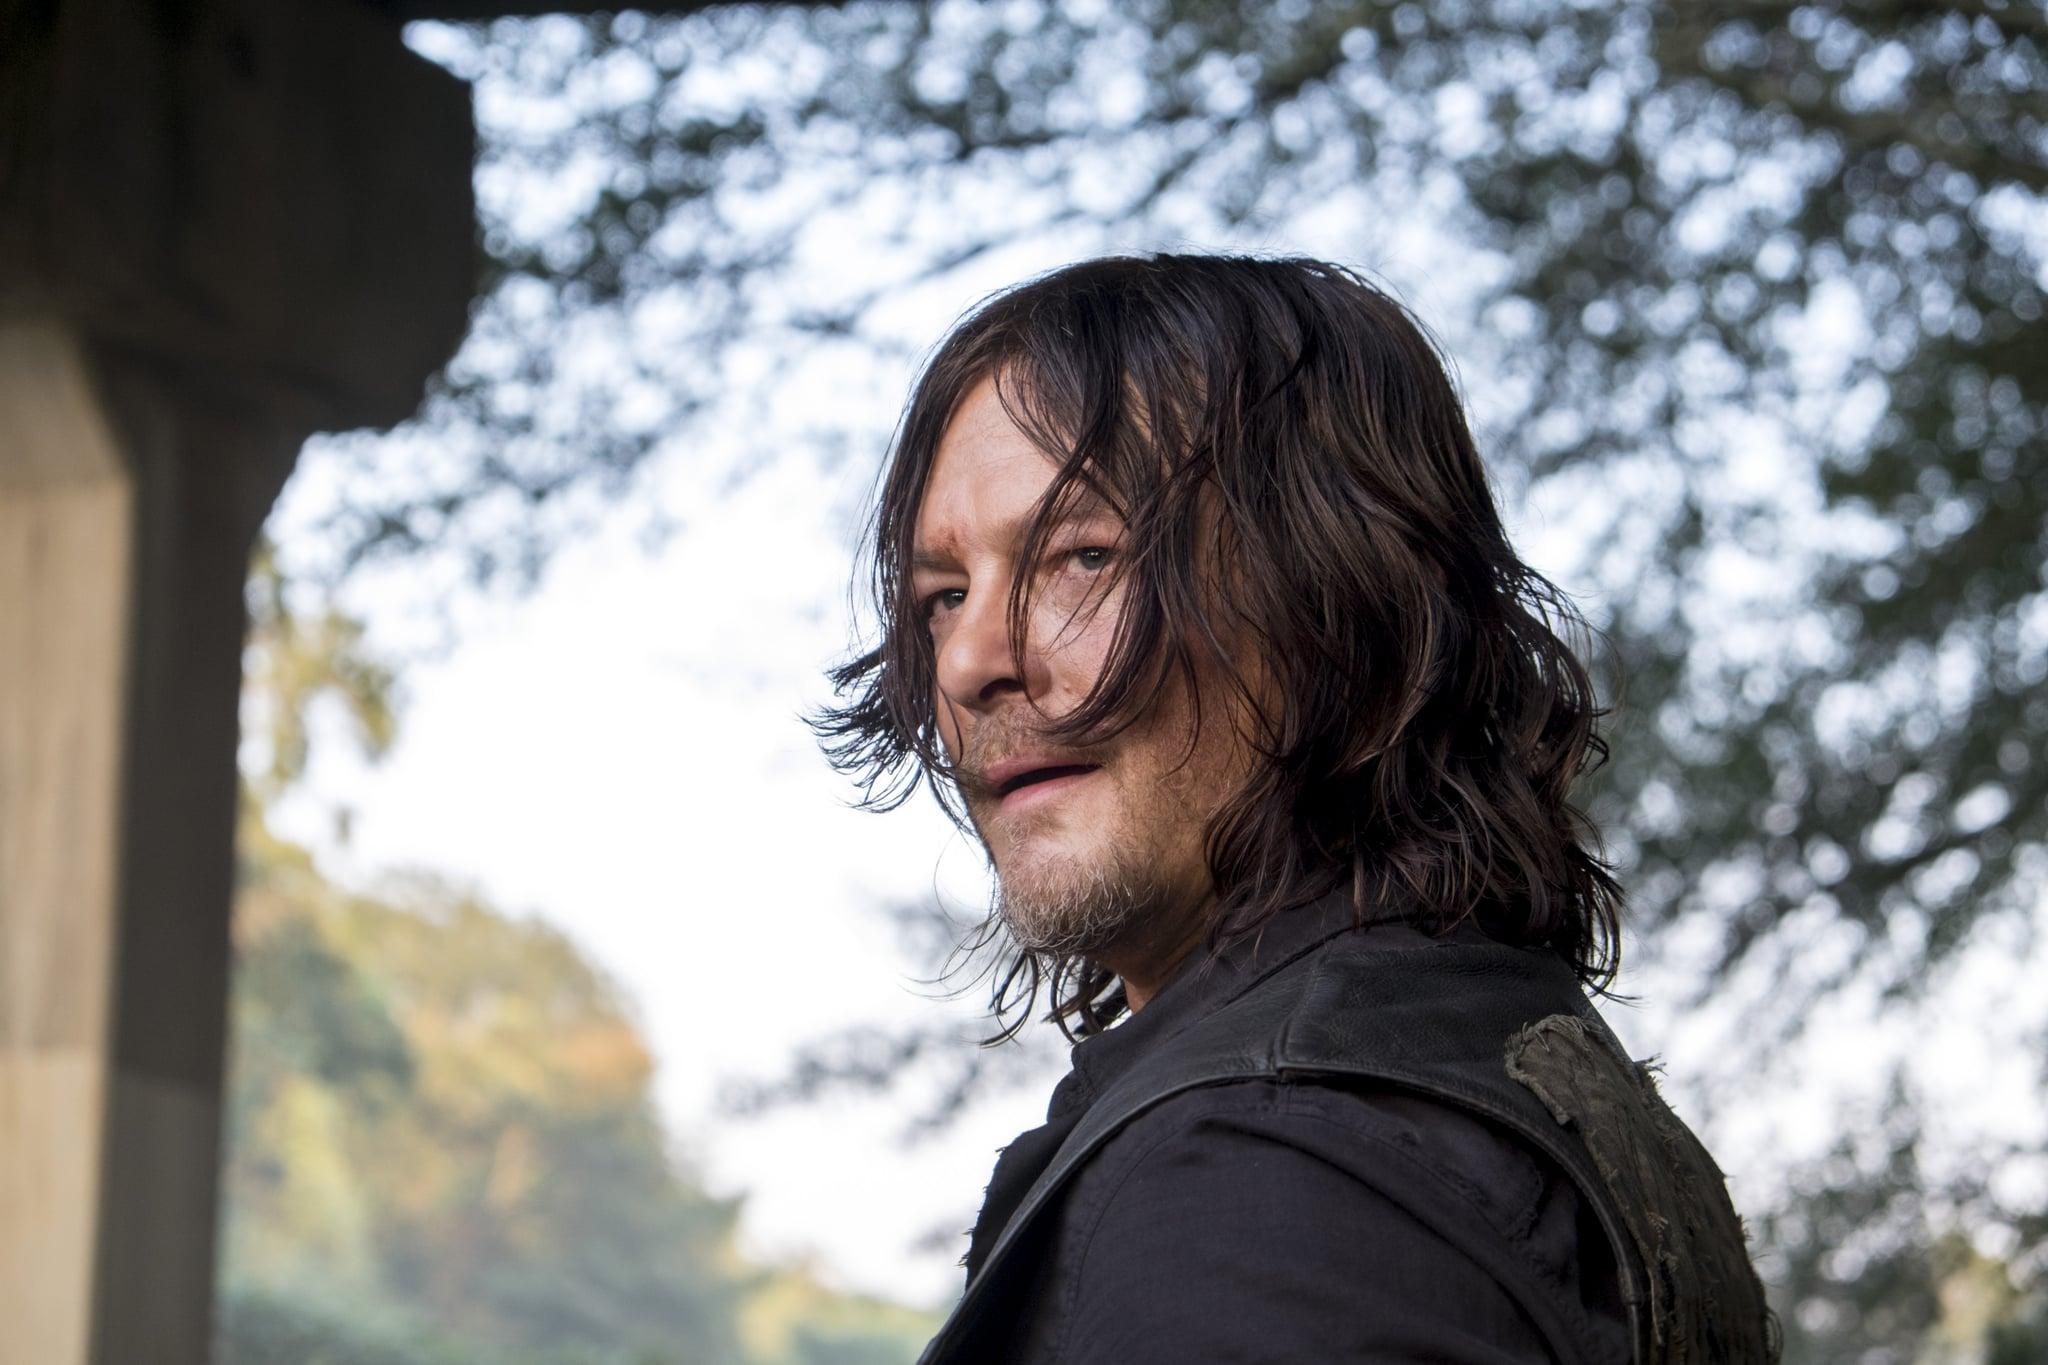 Norman Reedus as Daryl Dixon; single - The Walking Dead _ Season 8, Episode 11 - Photo Credit: Gene Page/AMC